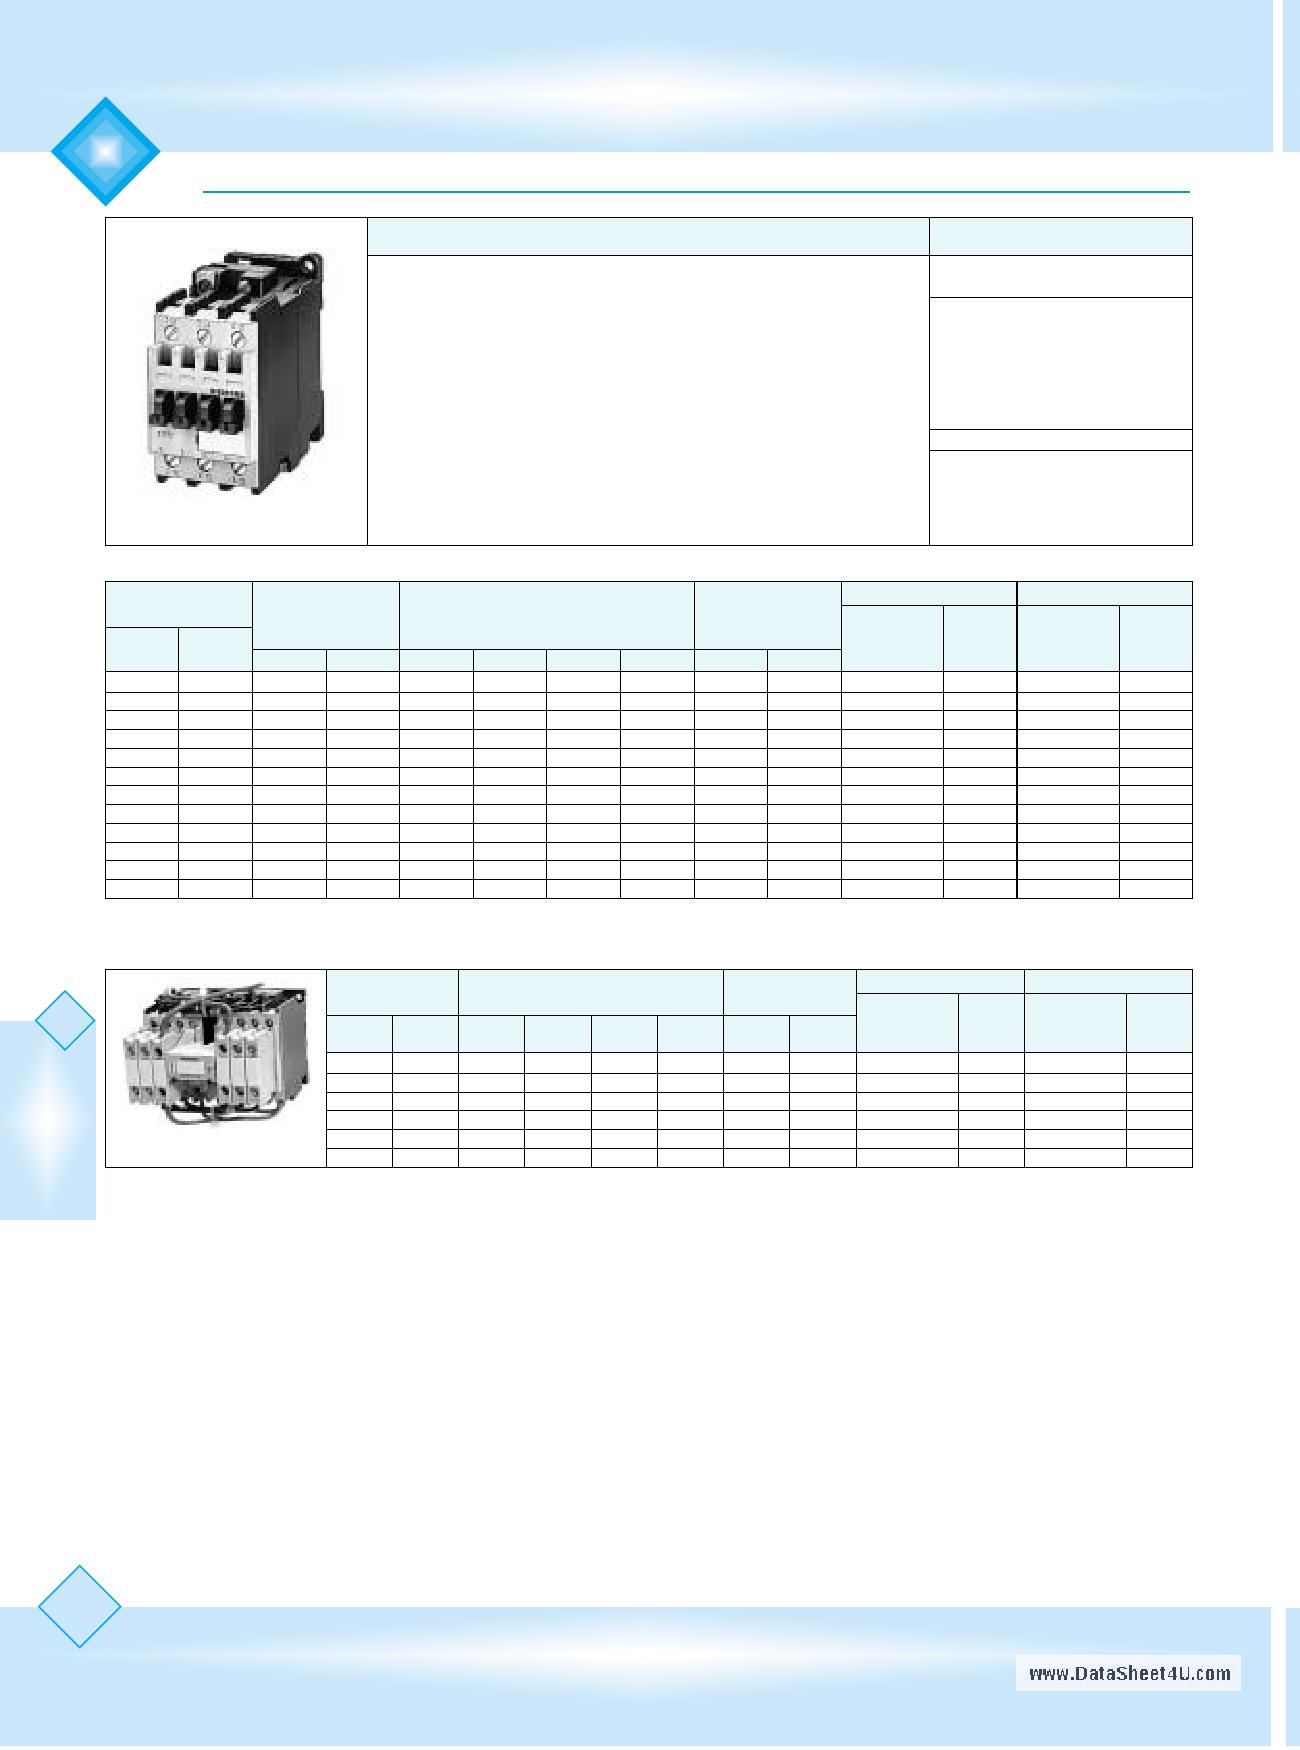 3TF3 Datasheet, 3TF3 PDF,ピン配置, 機能